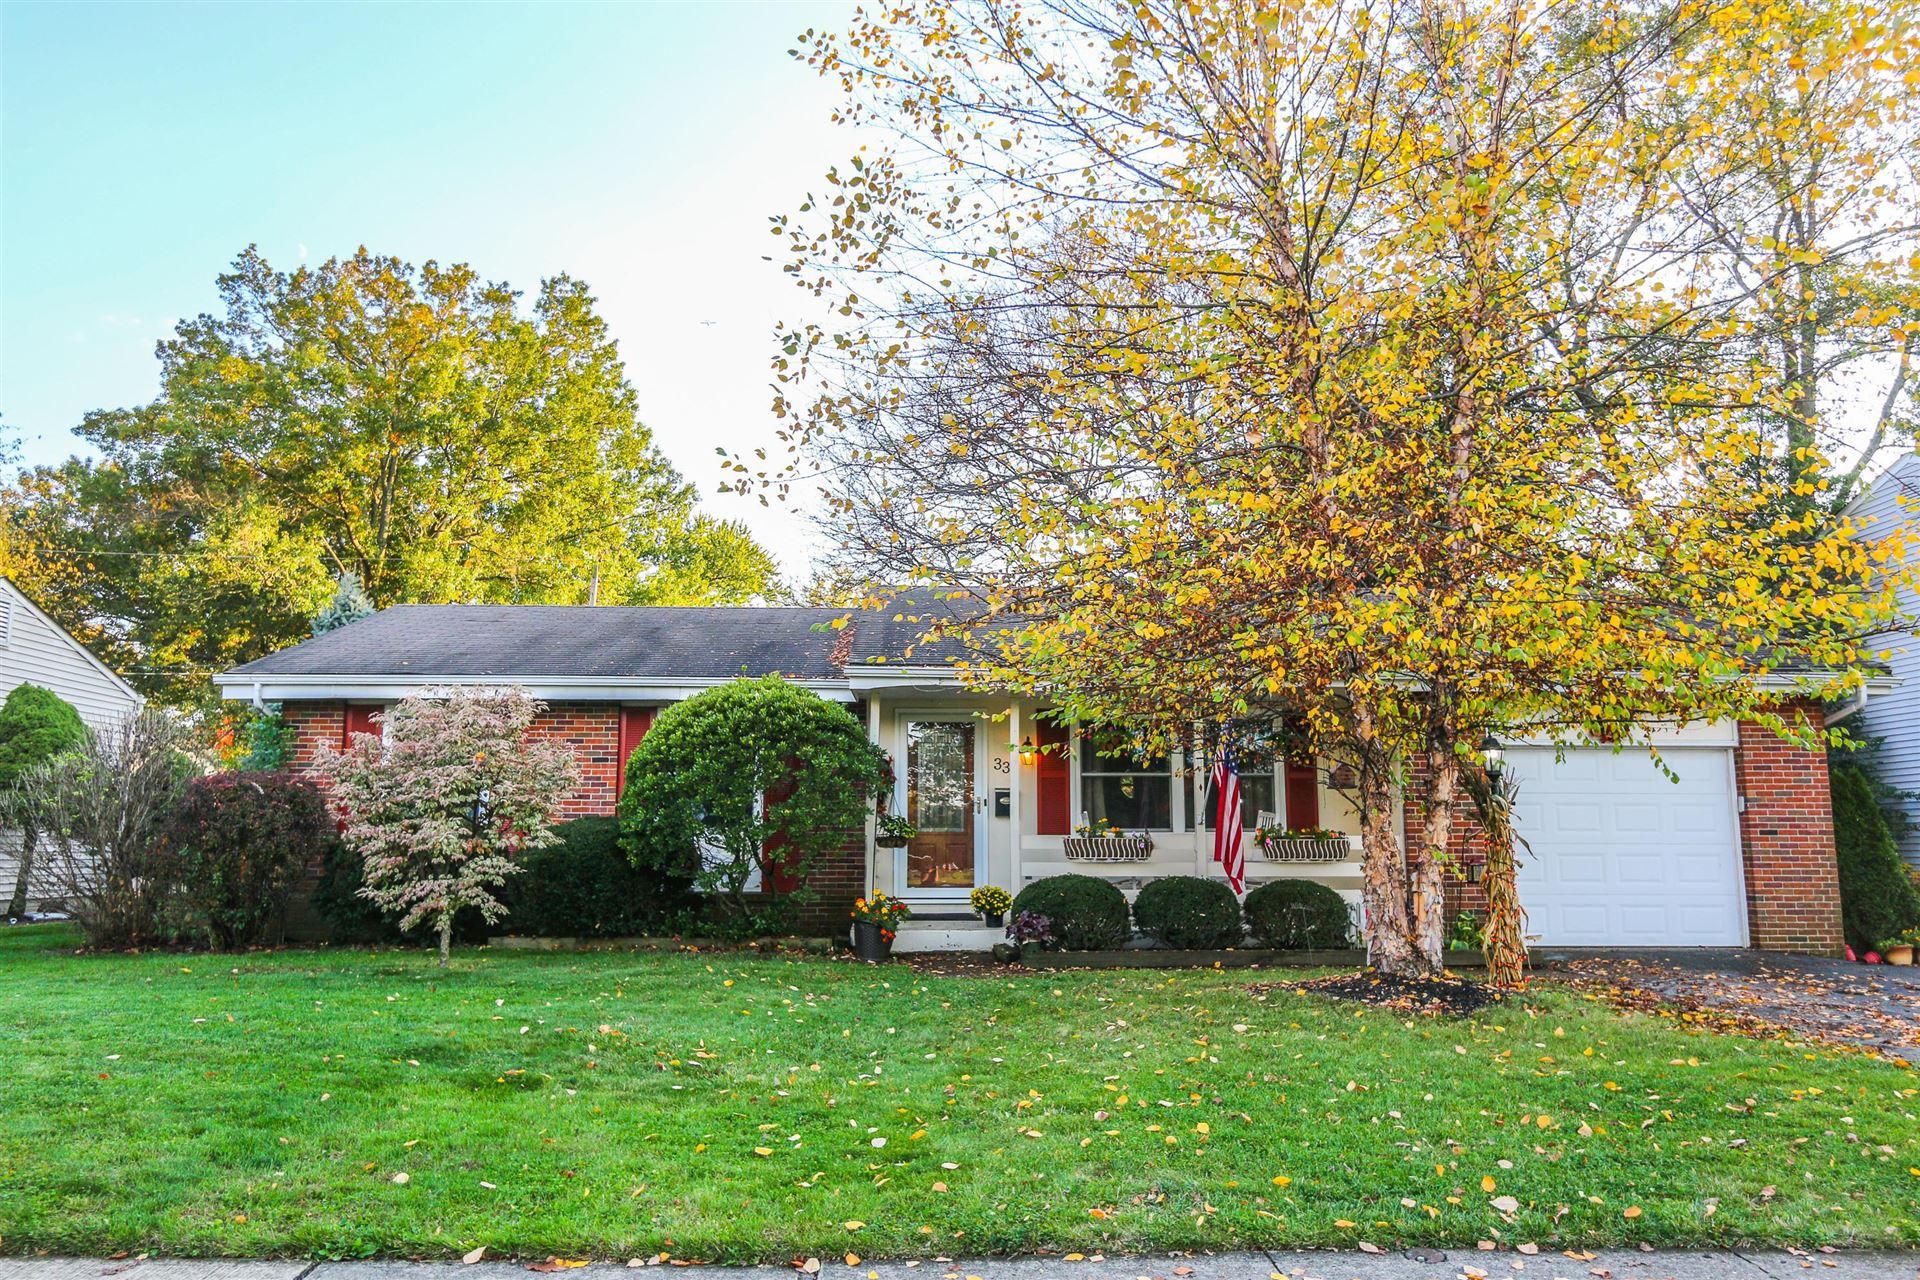 Photo of 331 Hennessey Avenue, Worthington, OH 43085 (MLS # 220038581)